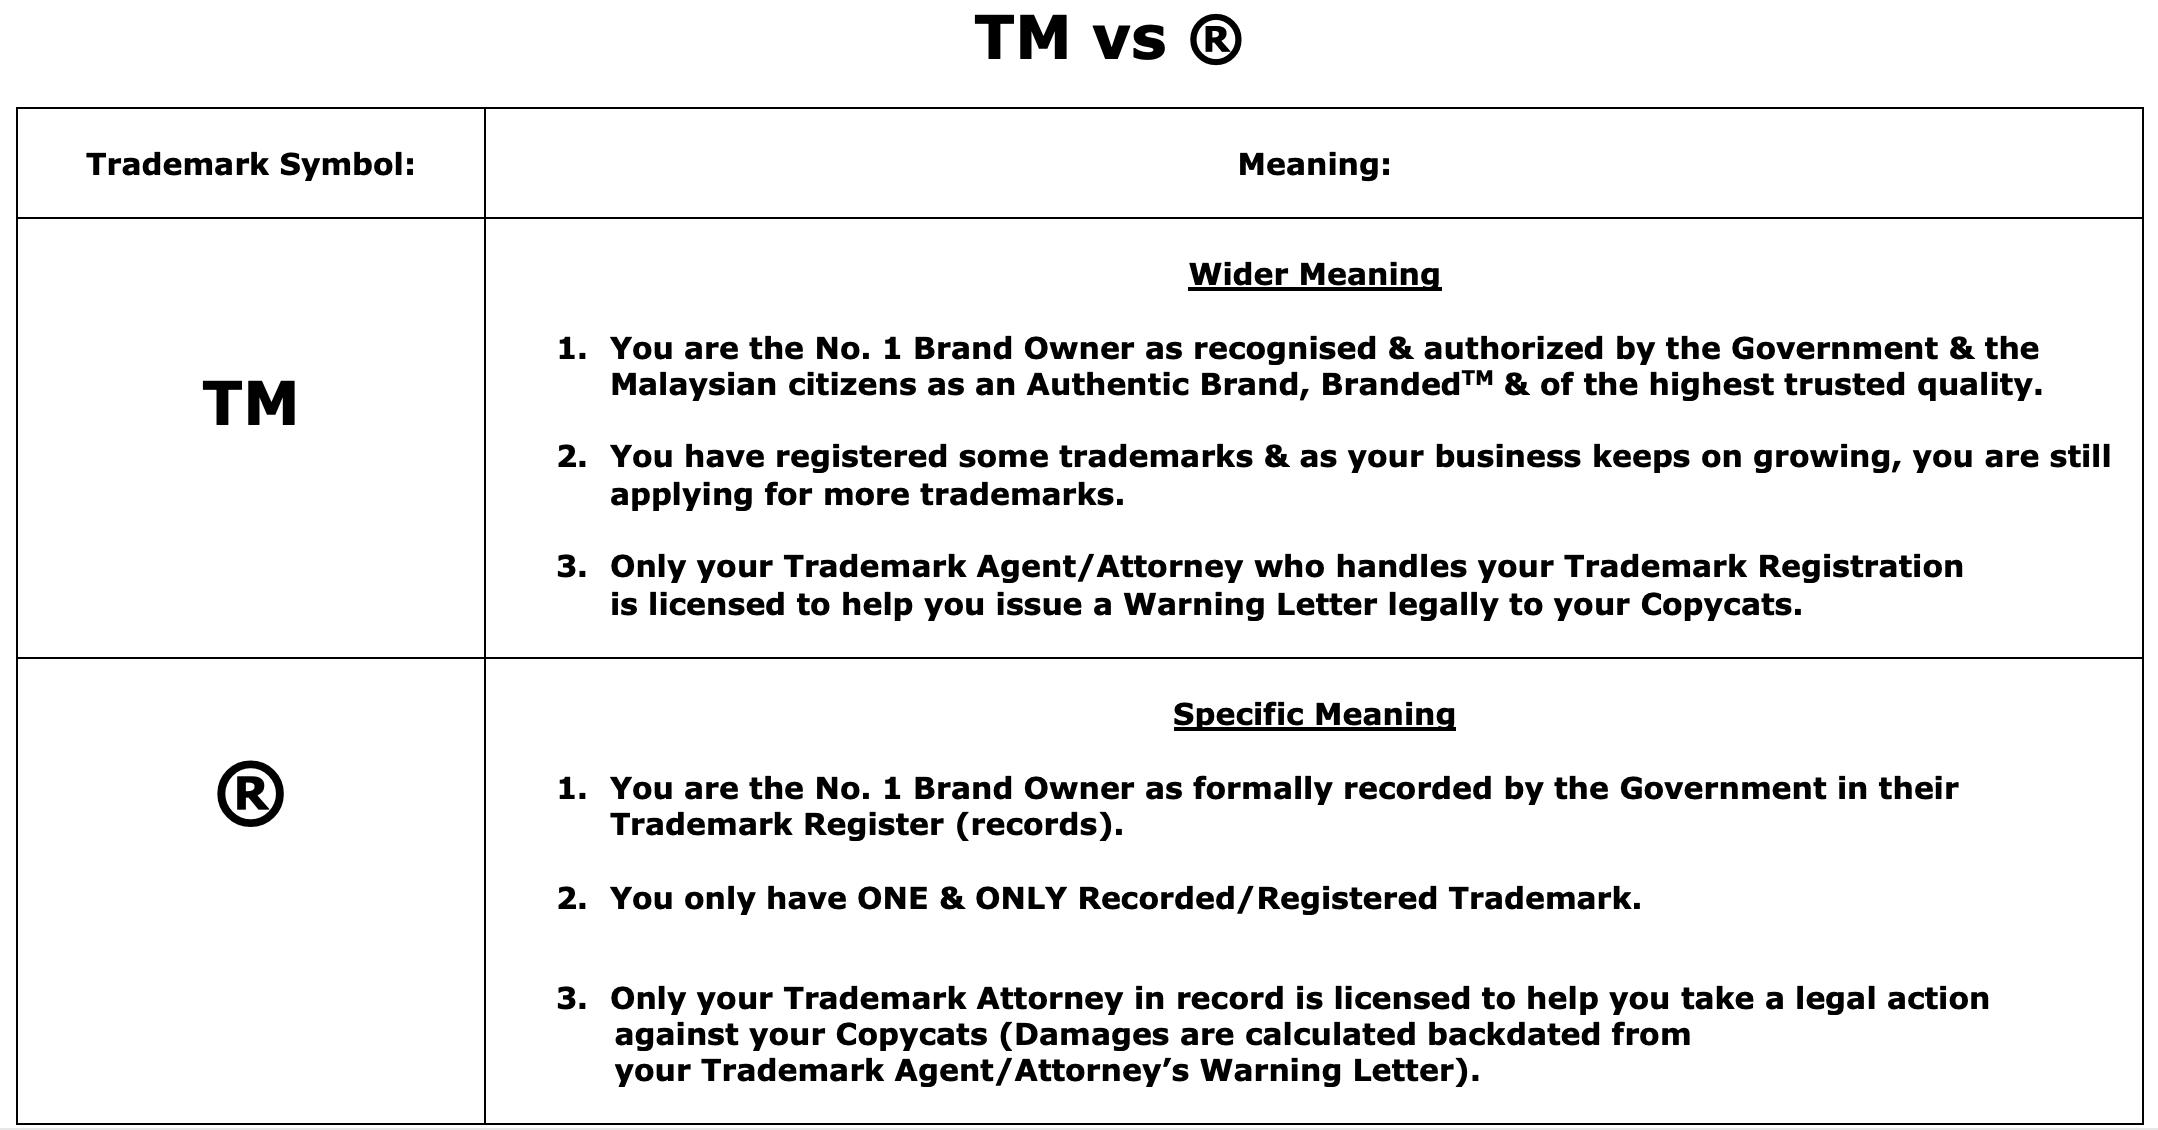 TM vs R